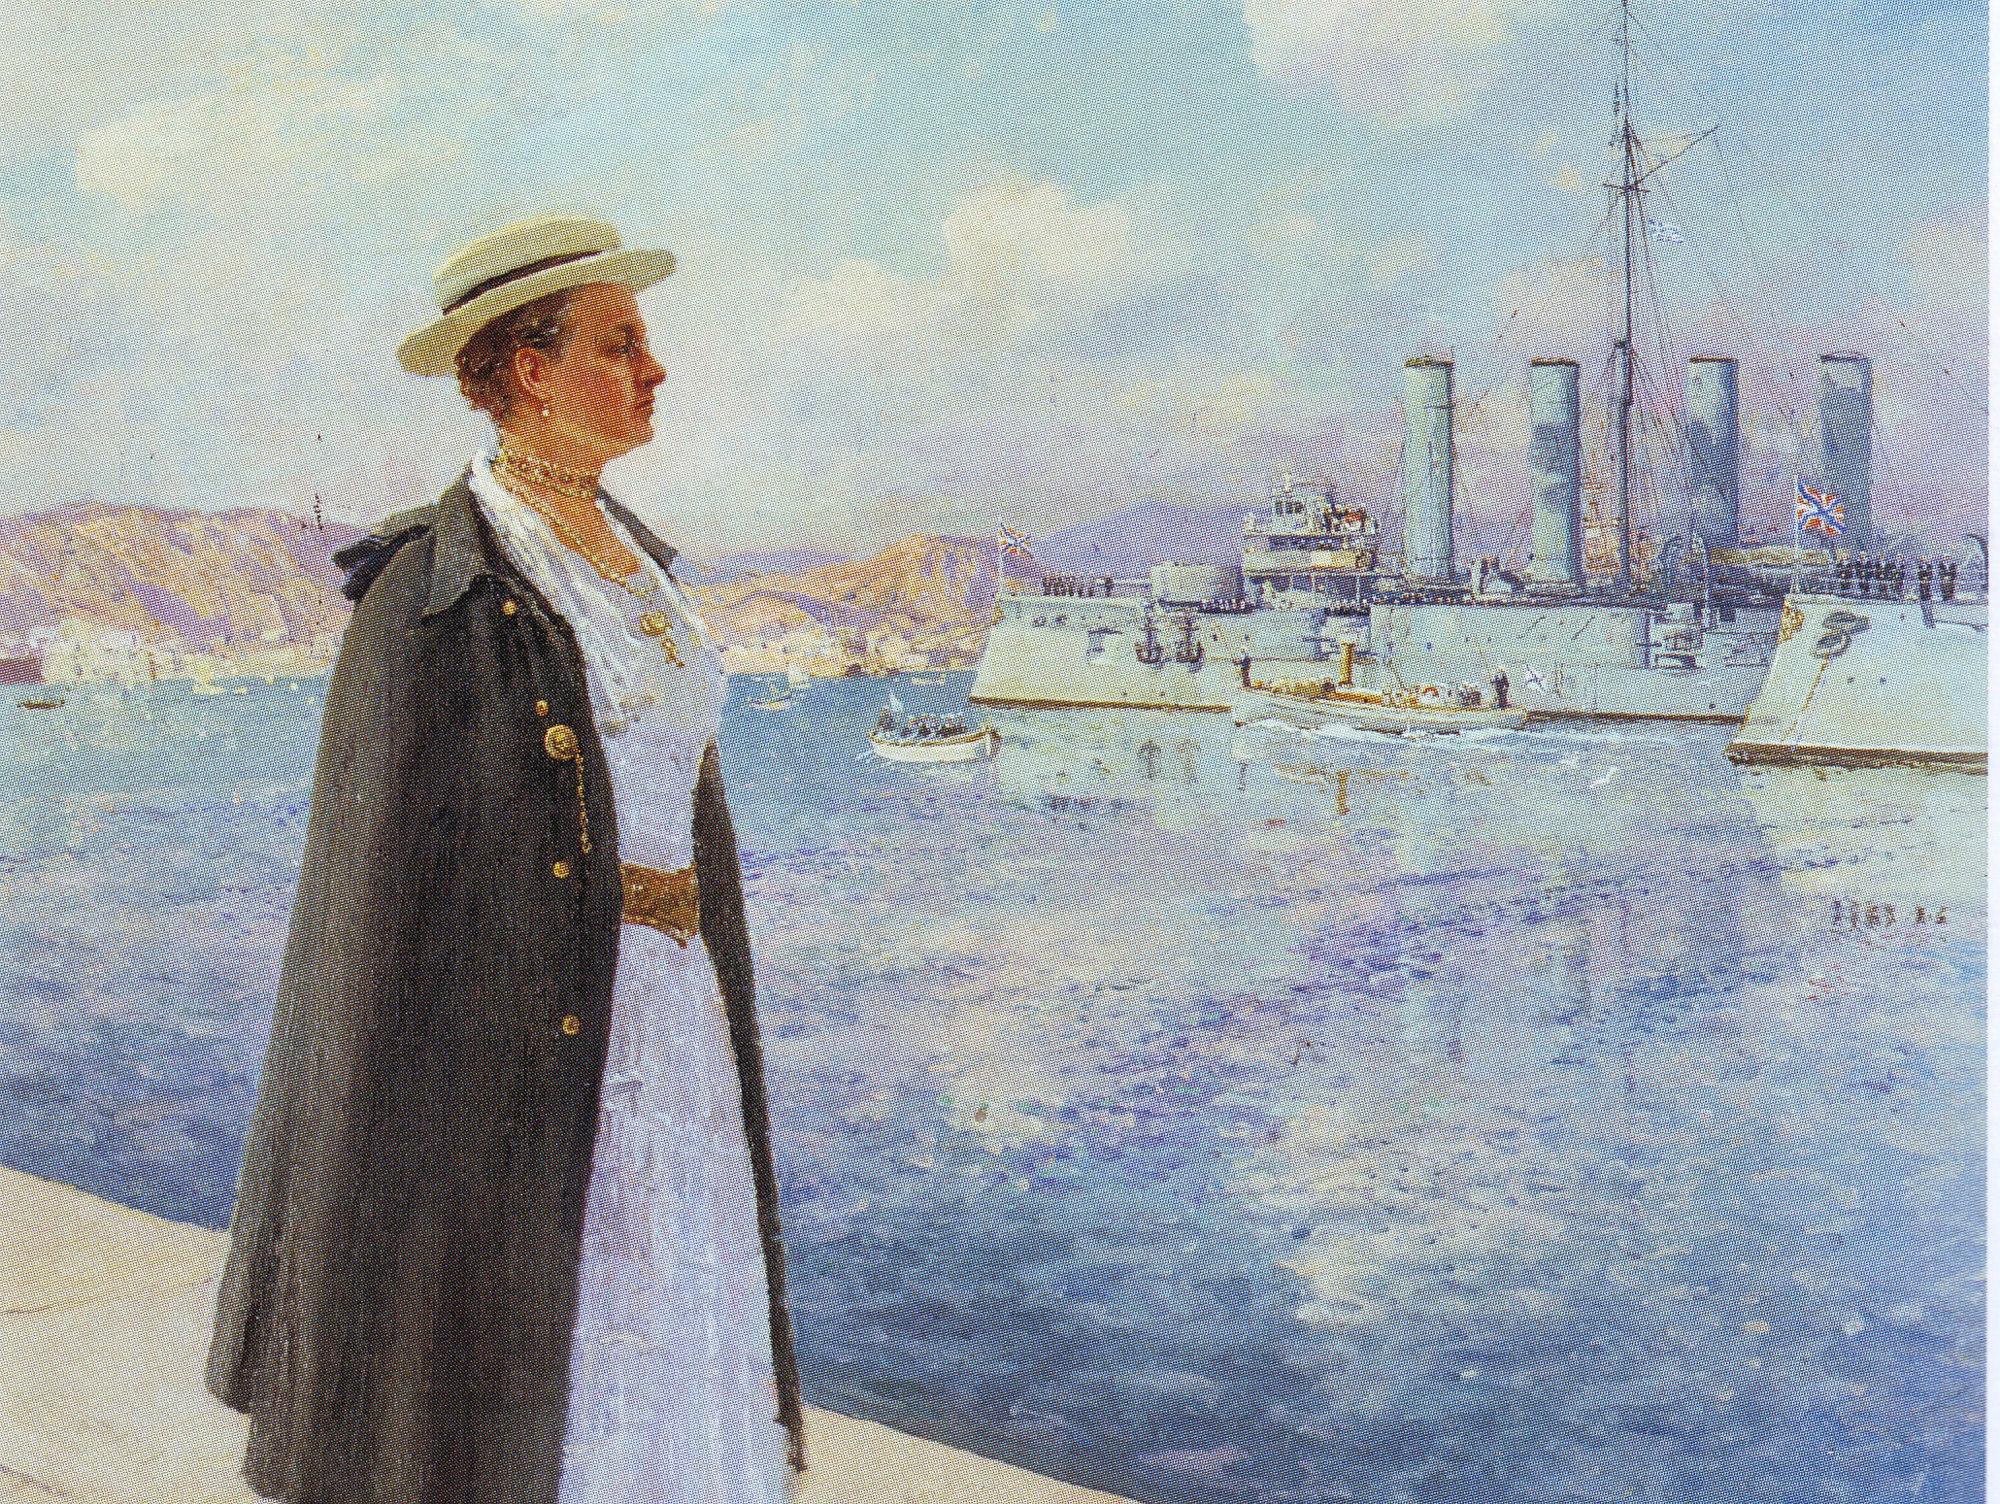 Королева Эллинов Ольга Константиновна шеф 12 ФЭ и КР Адмирал Макаров.jpg